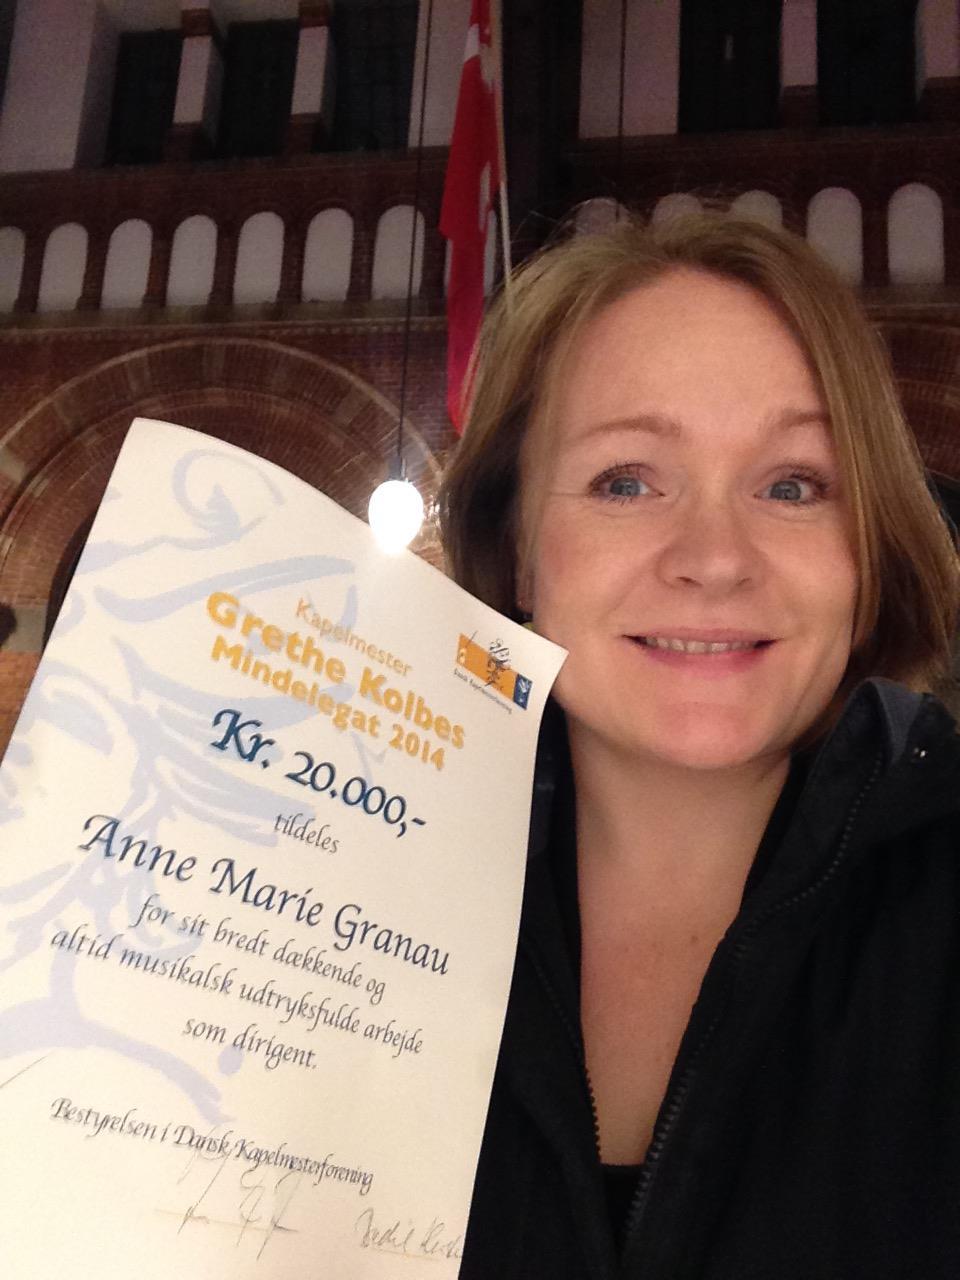 Conductor - Anne Marie Granau - Kolbes-mindelegat 2014